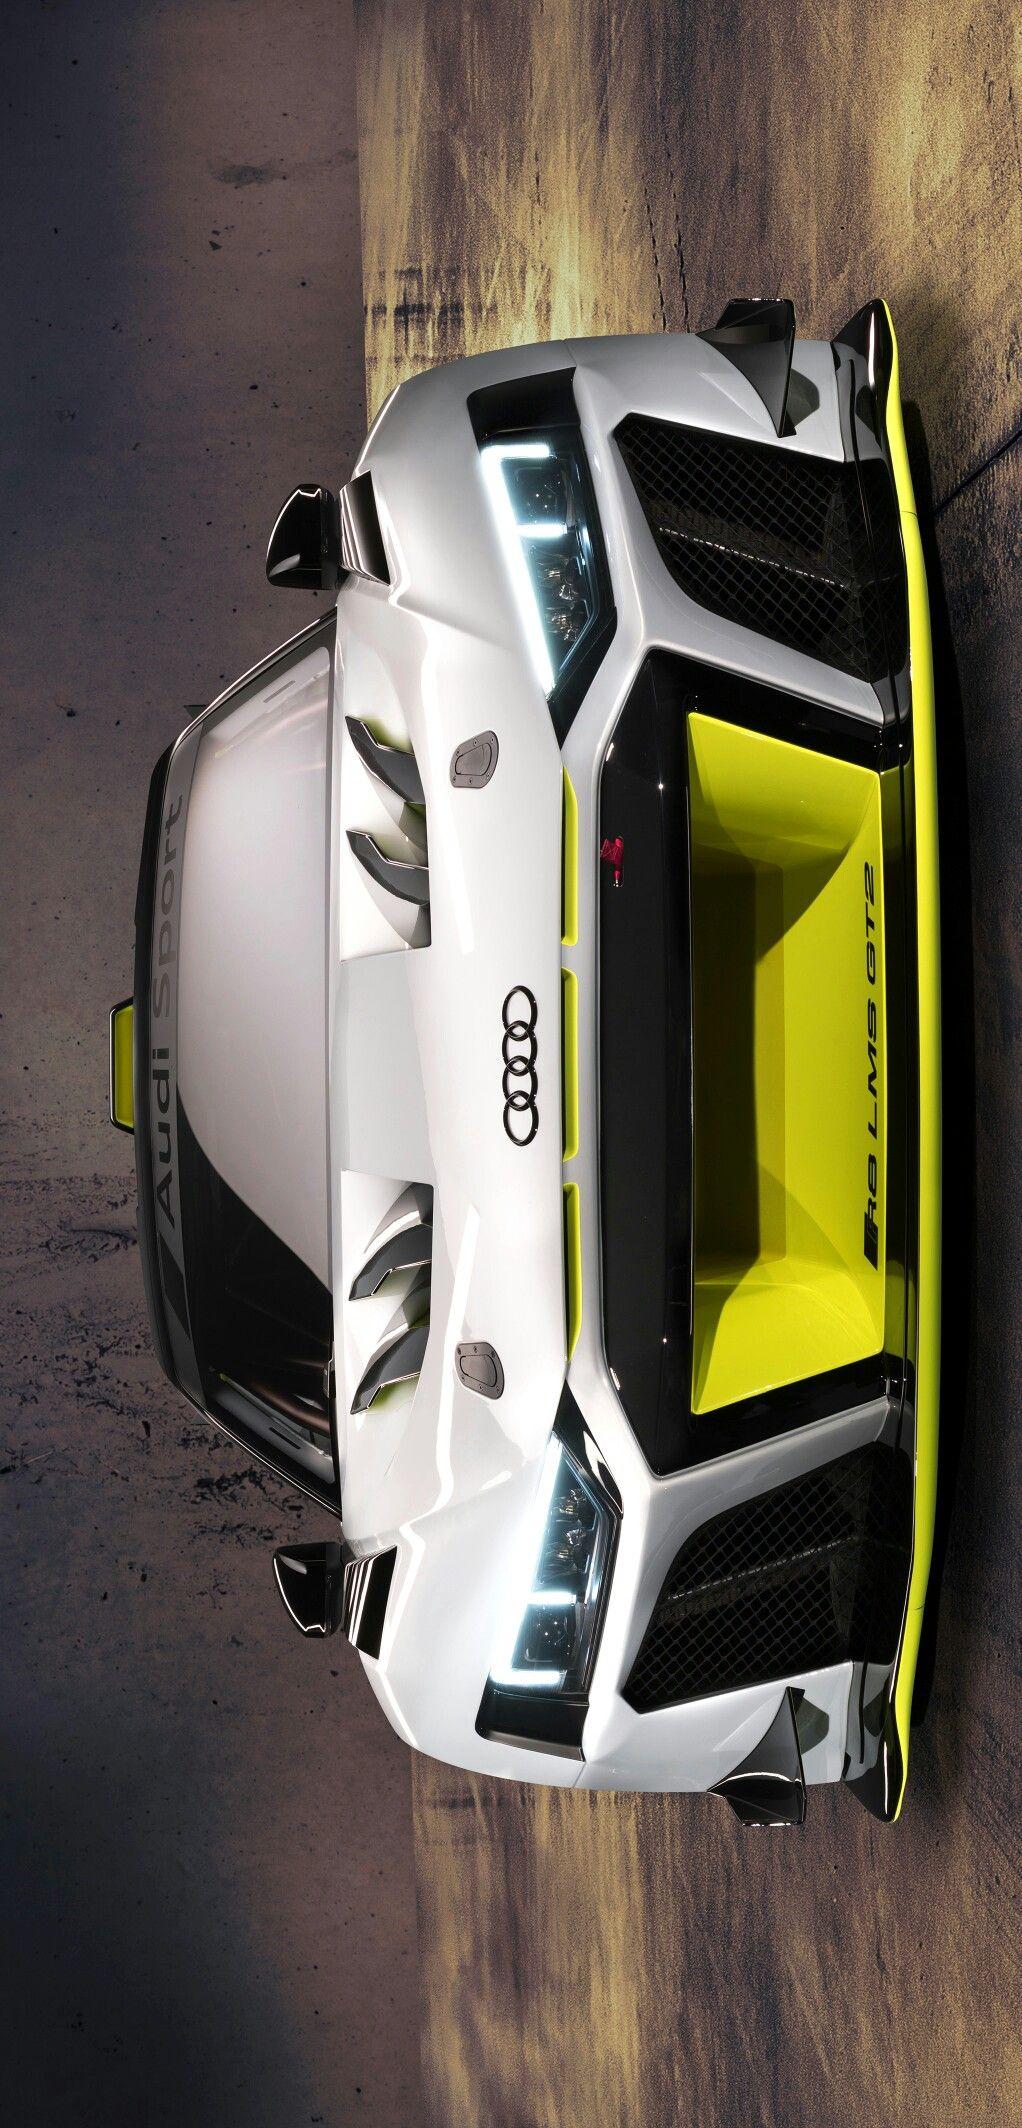 2020 Audi Motorsports R8 V10 Lms Gt2 Image Enhancements By Keely Vonmonski Audi Cars Motorsport Audi